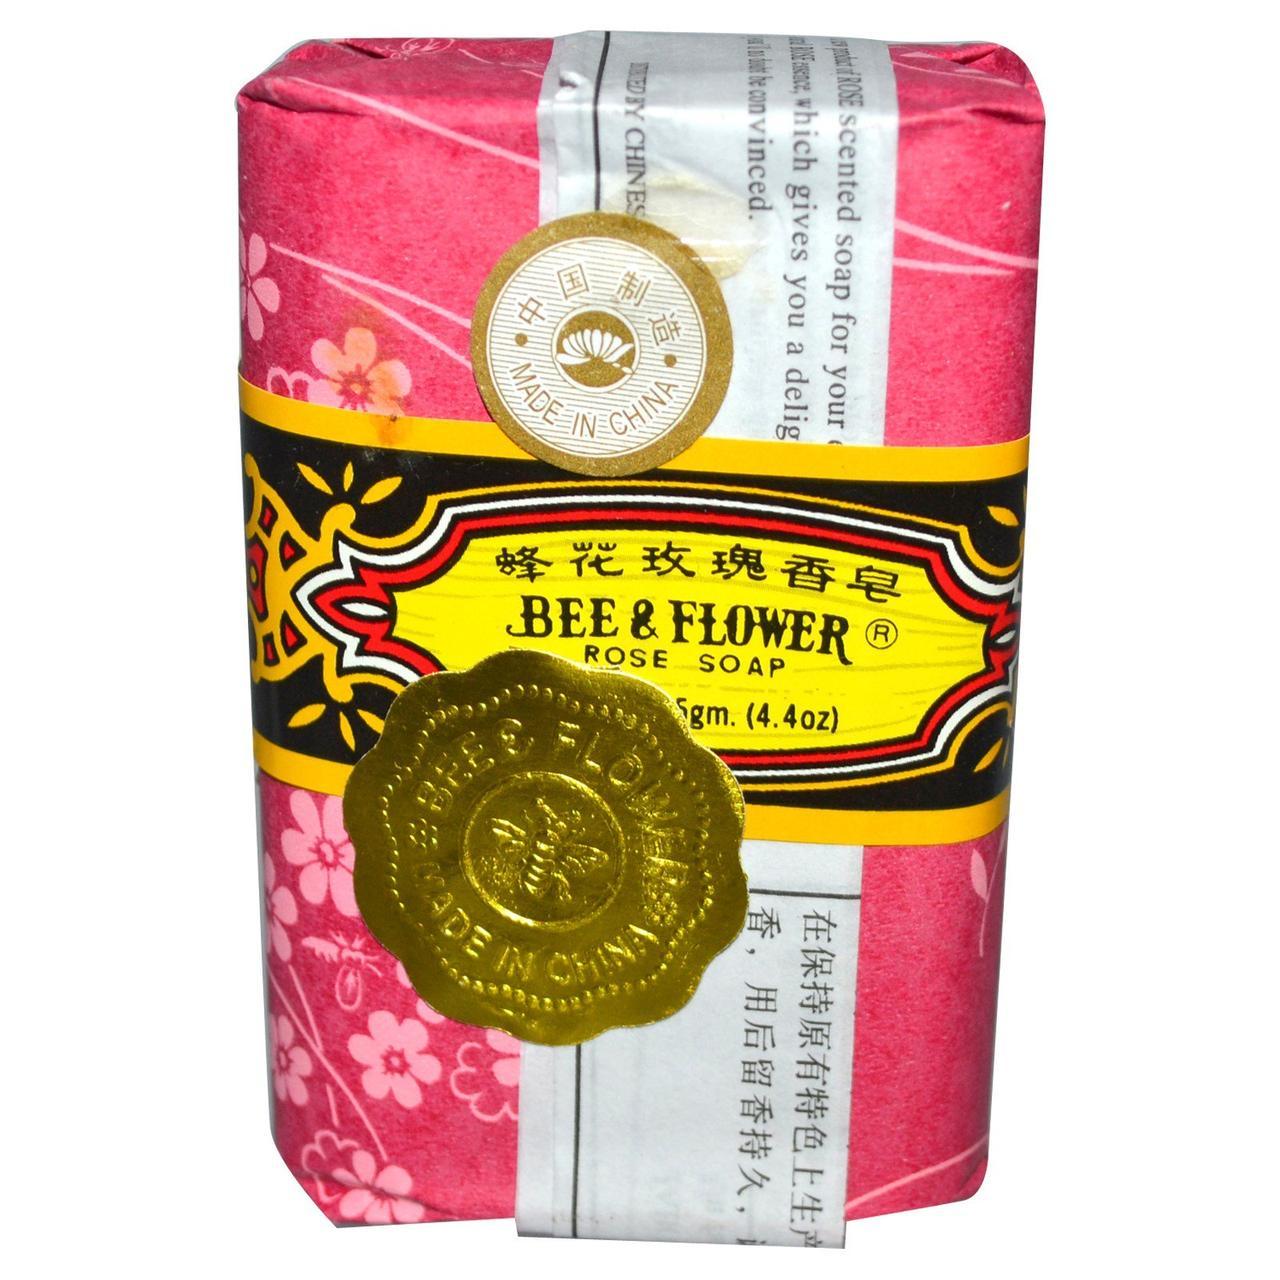 Мыло из роз, Soap, Bee & Flower, 125 гр.